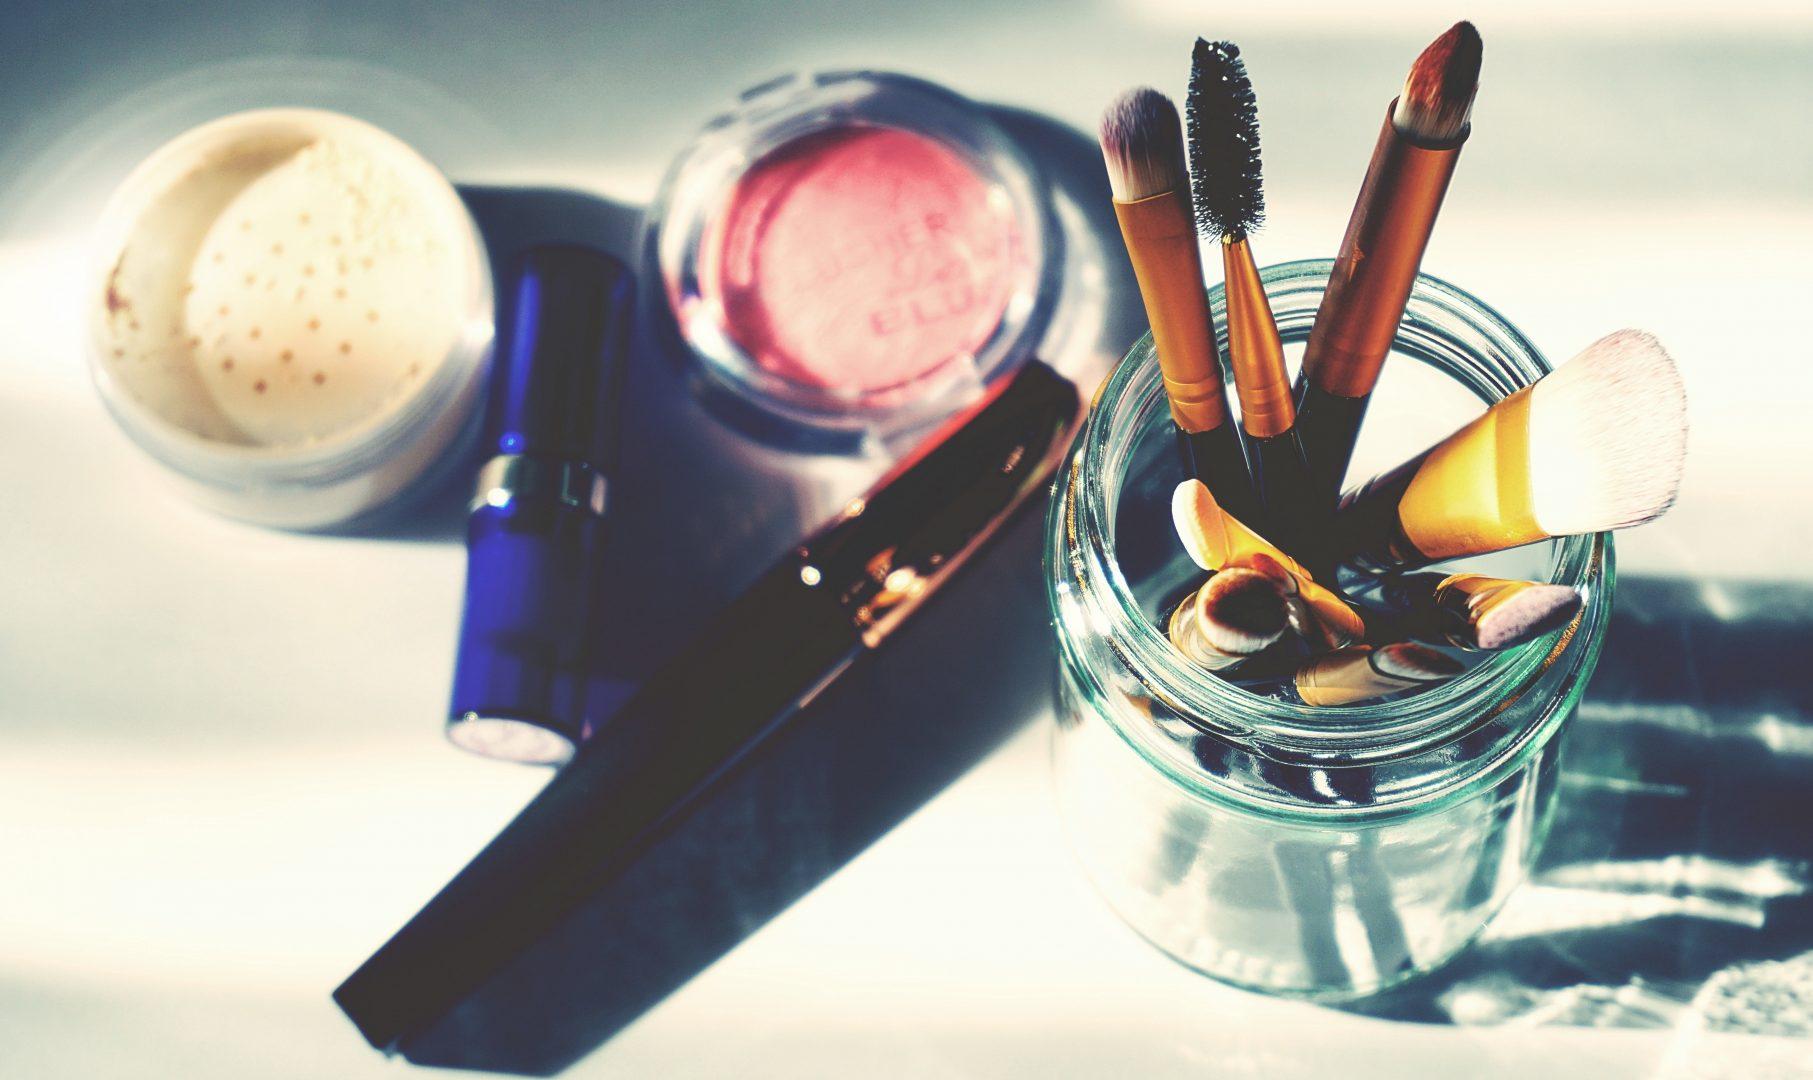 masa kadaluarsa alat kosmetik